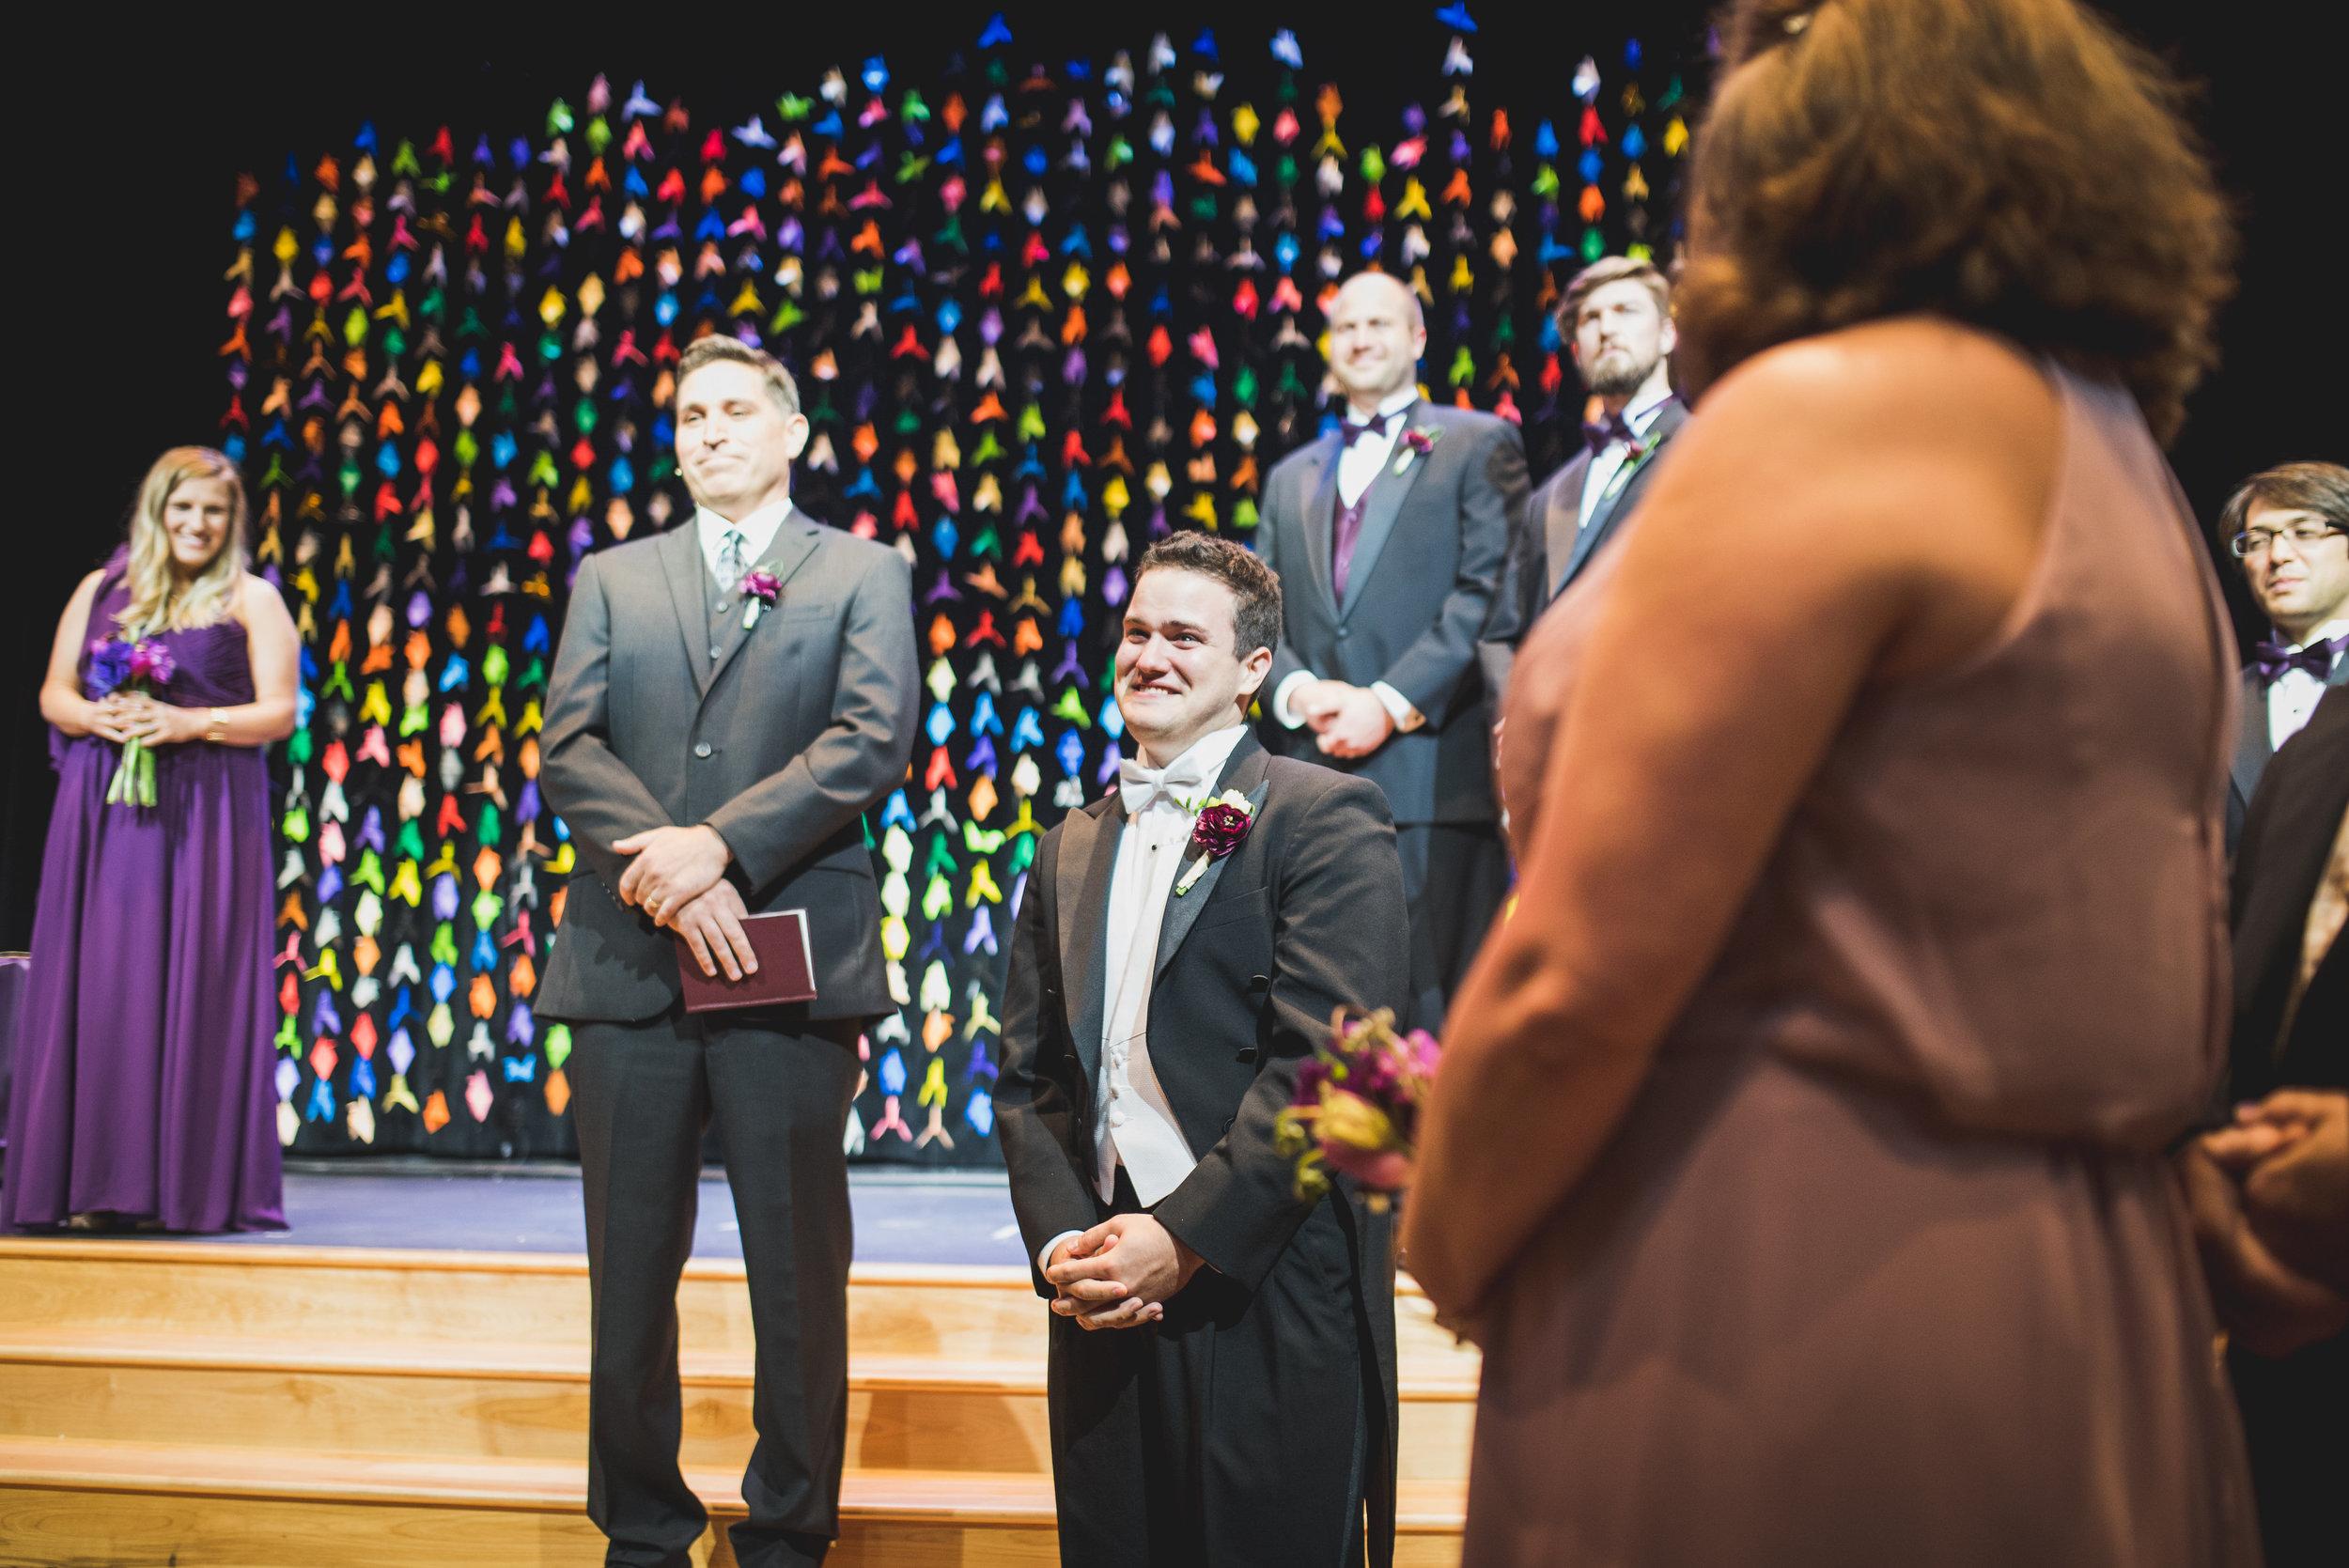 Nashville Wedding Photographers Opera House-359.jpg